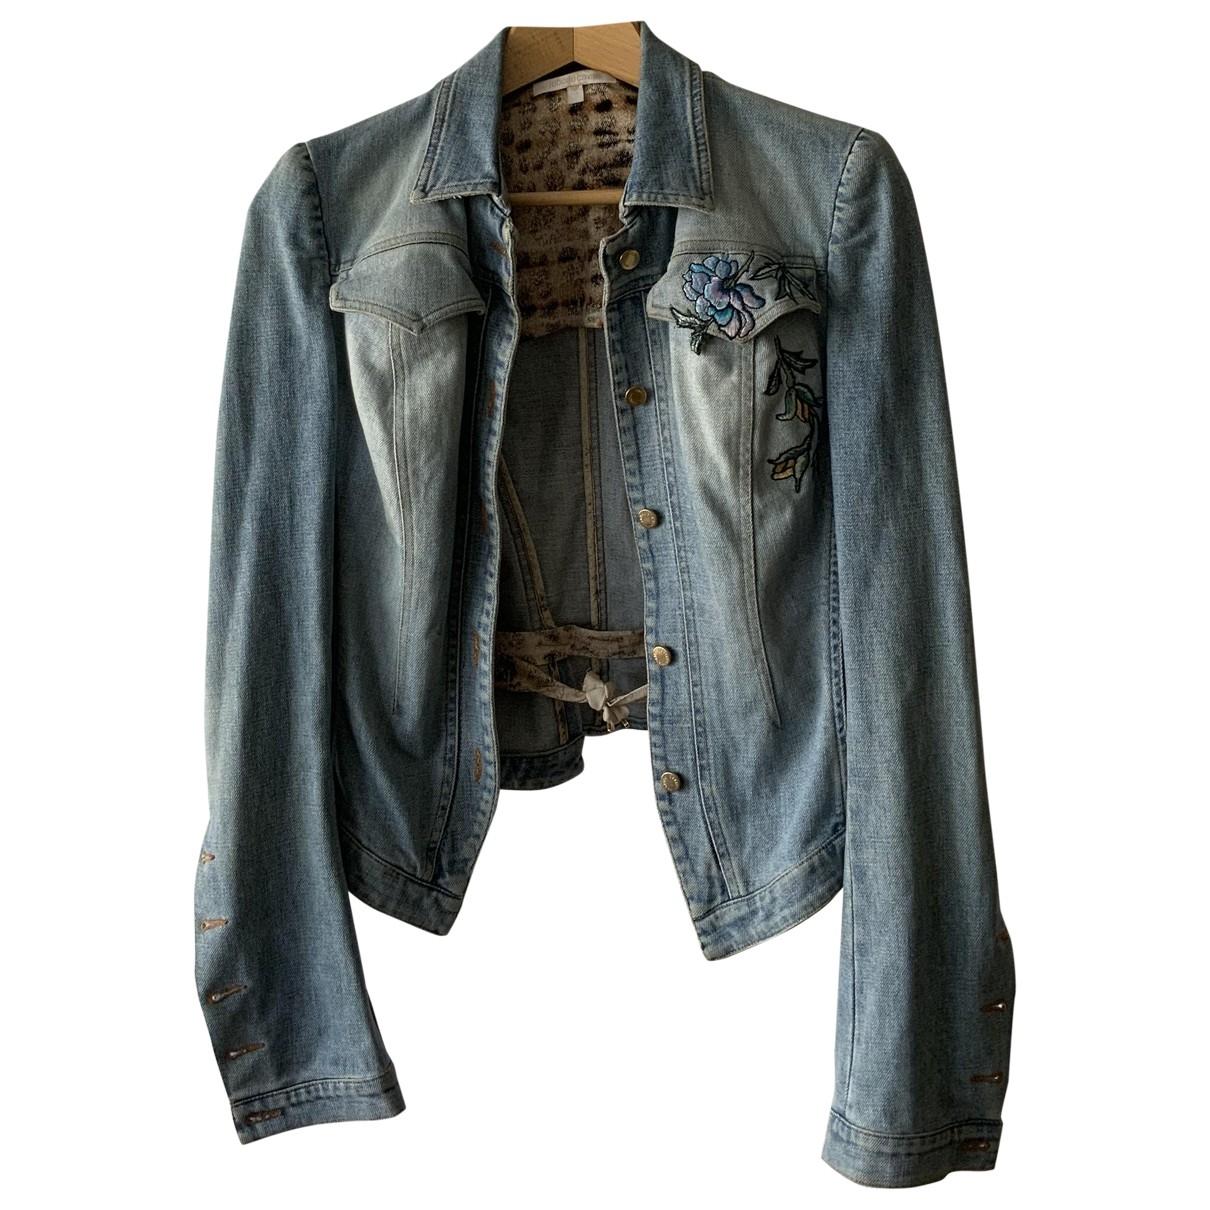 Roberto Cavalli \N Jacke in  Blau Denim - Jeans